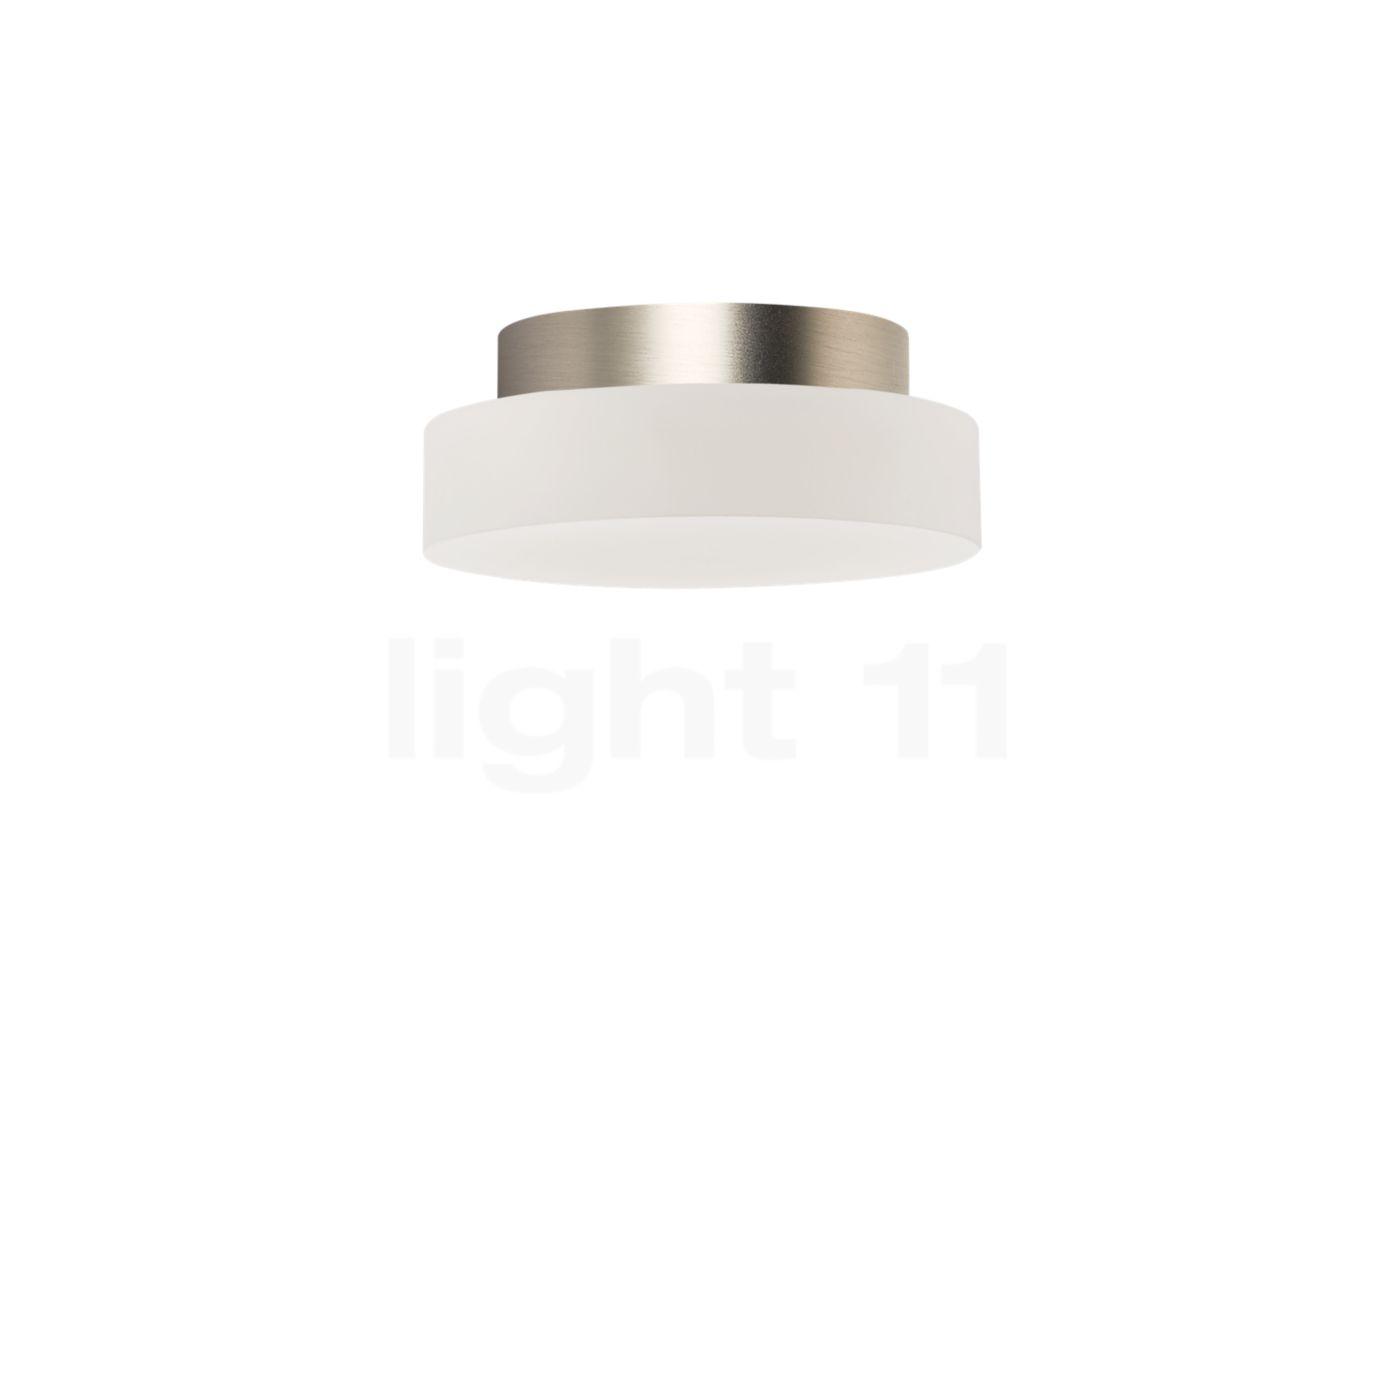 Top Light Allround Flat Plafonnier ø12 cm LED, nickel mat